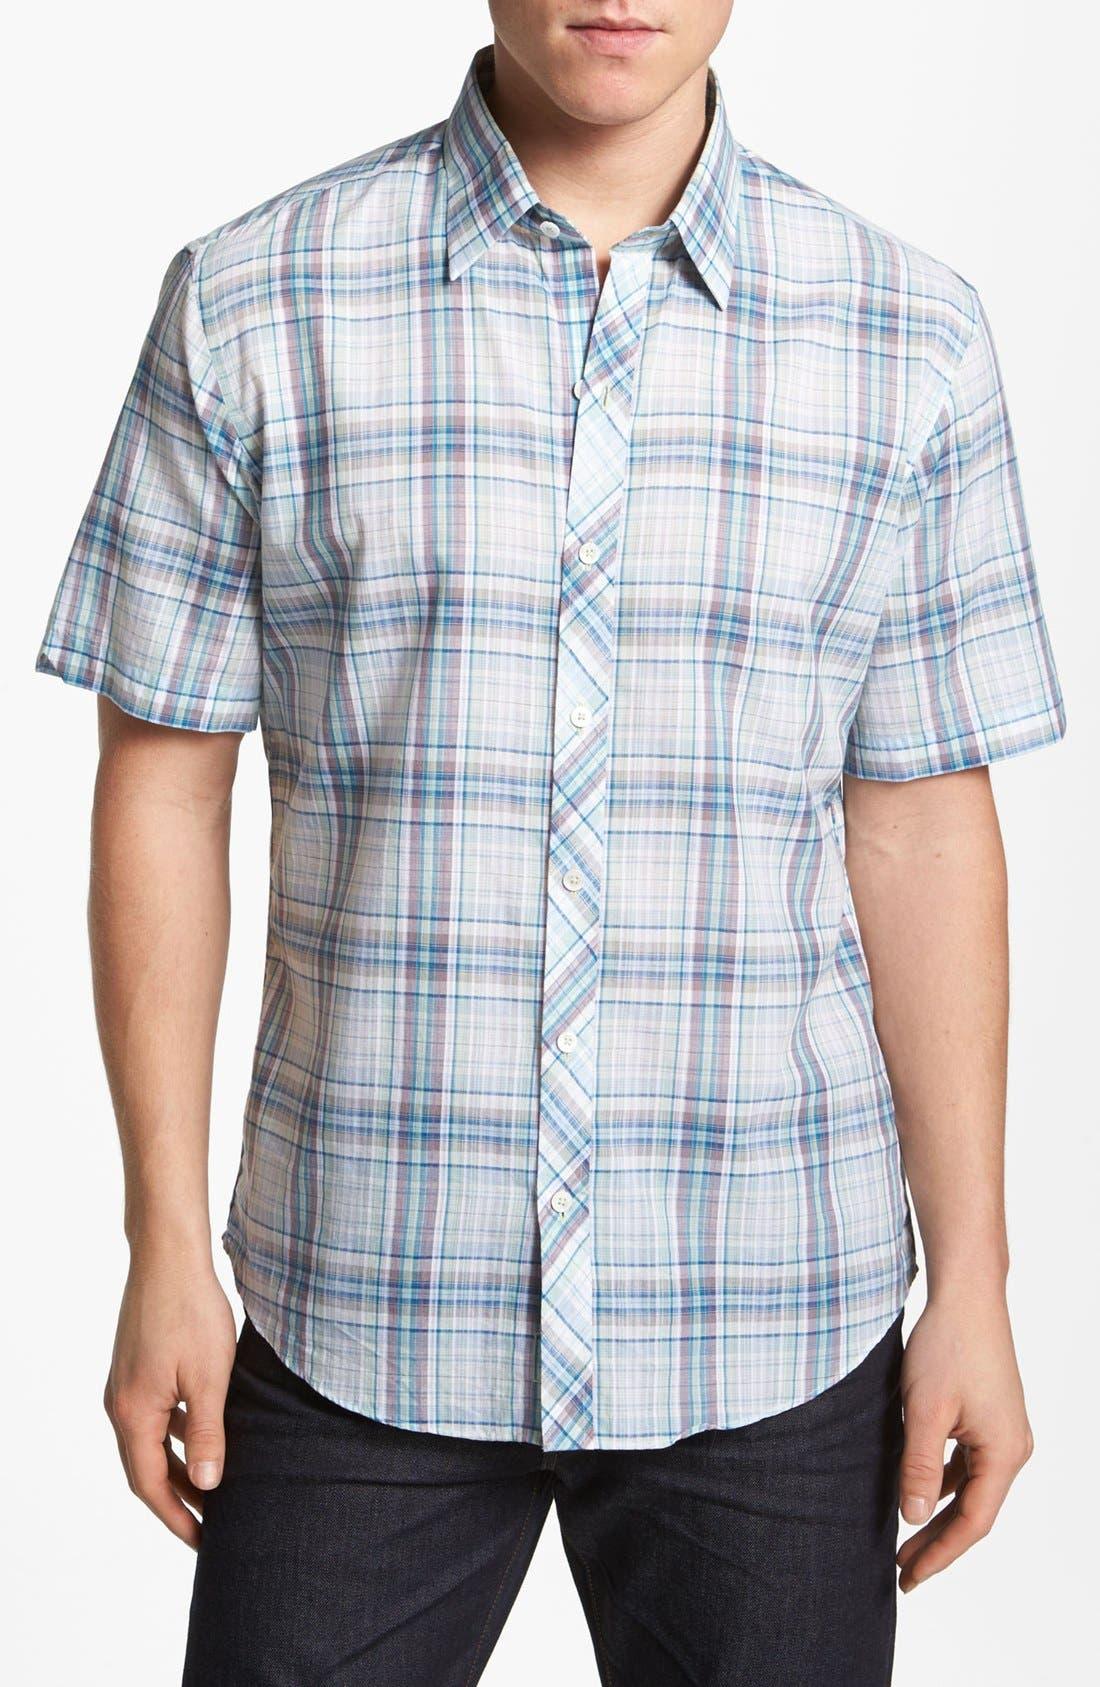 Alternate Image 1 Selected - Zachary Prell 'Soffer' Short Sleeve Sport Shirt